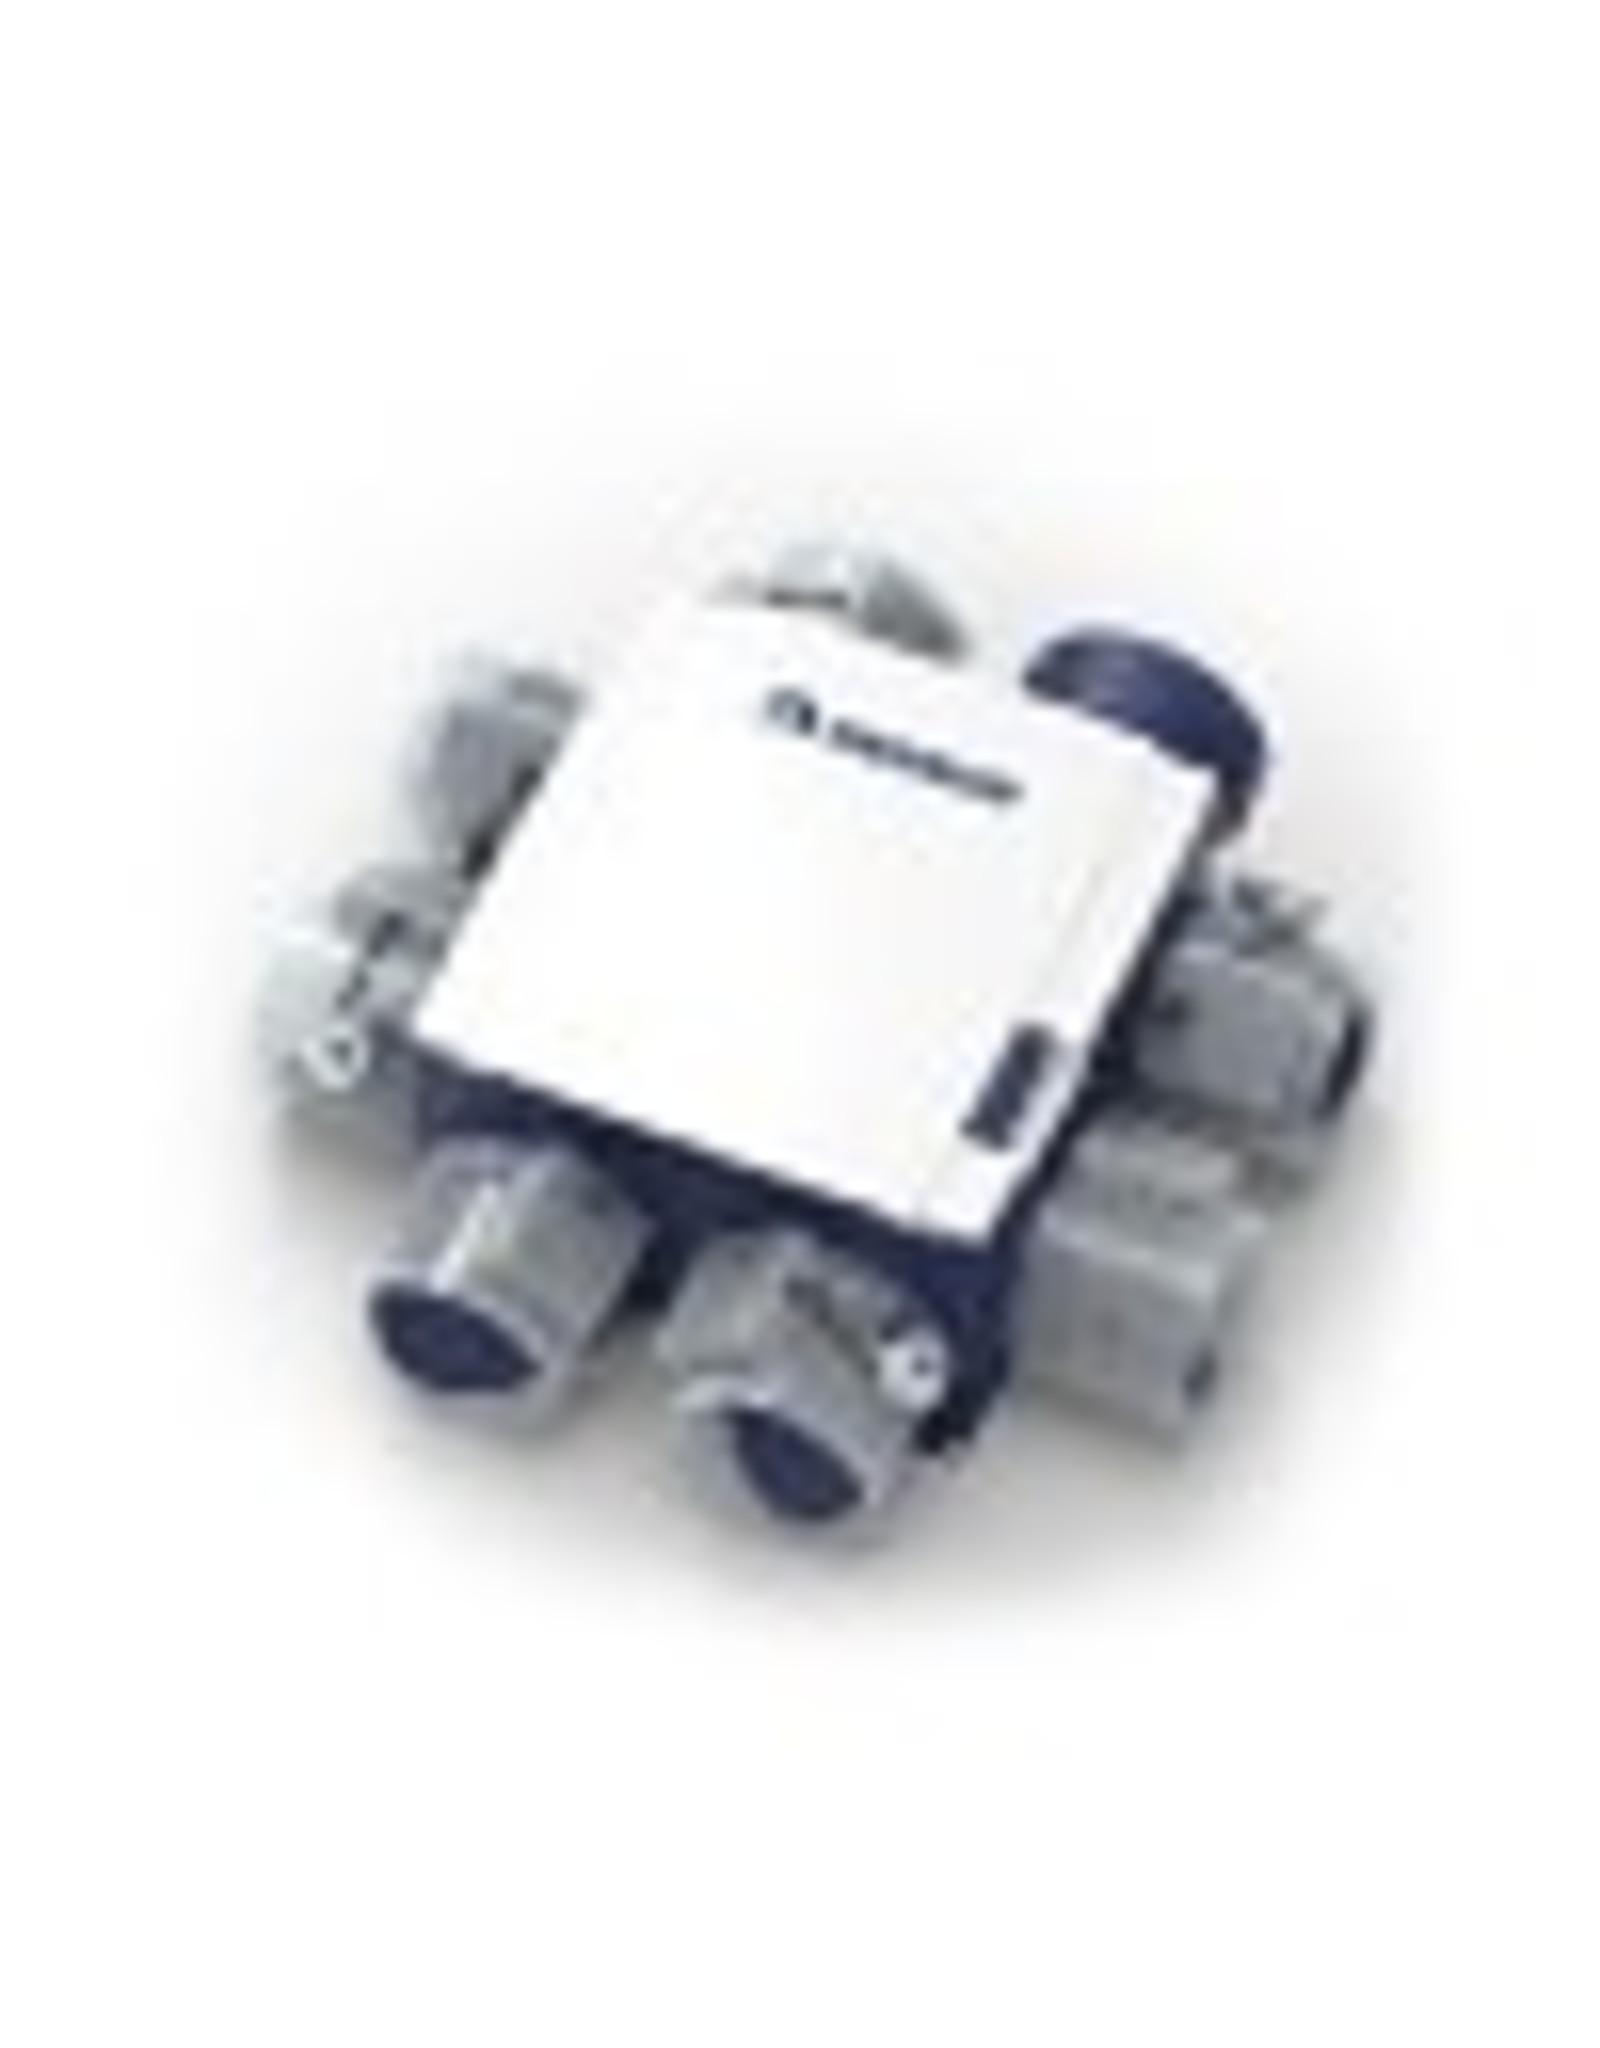 renson KIT Healthbox 3.0 - Systeem C+ 3.0 keuken badkamer toilet